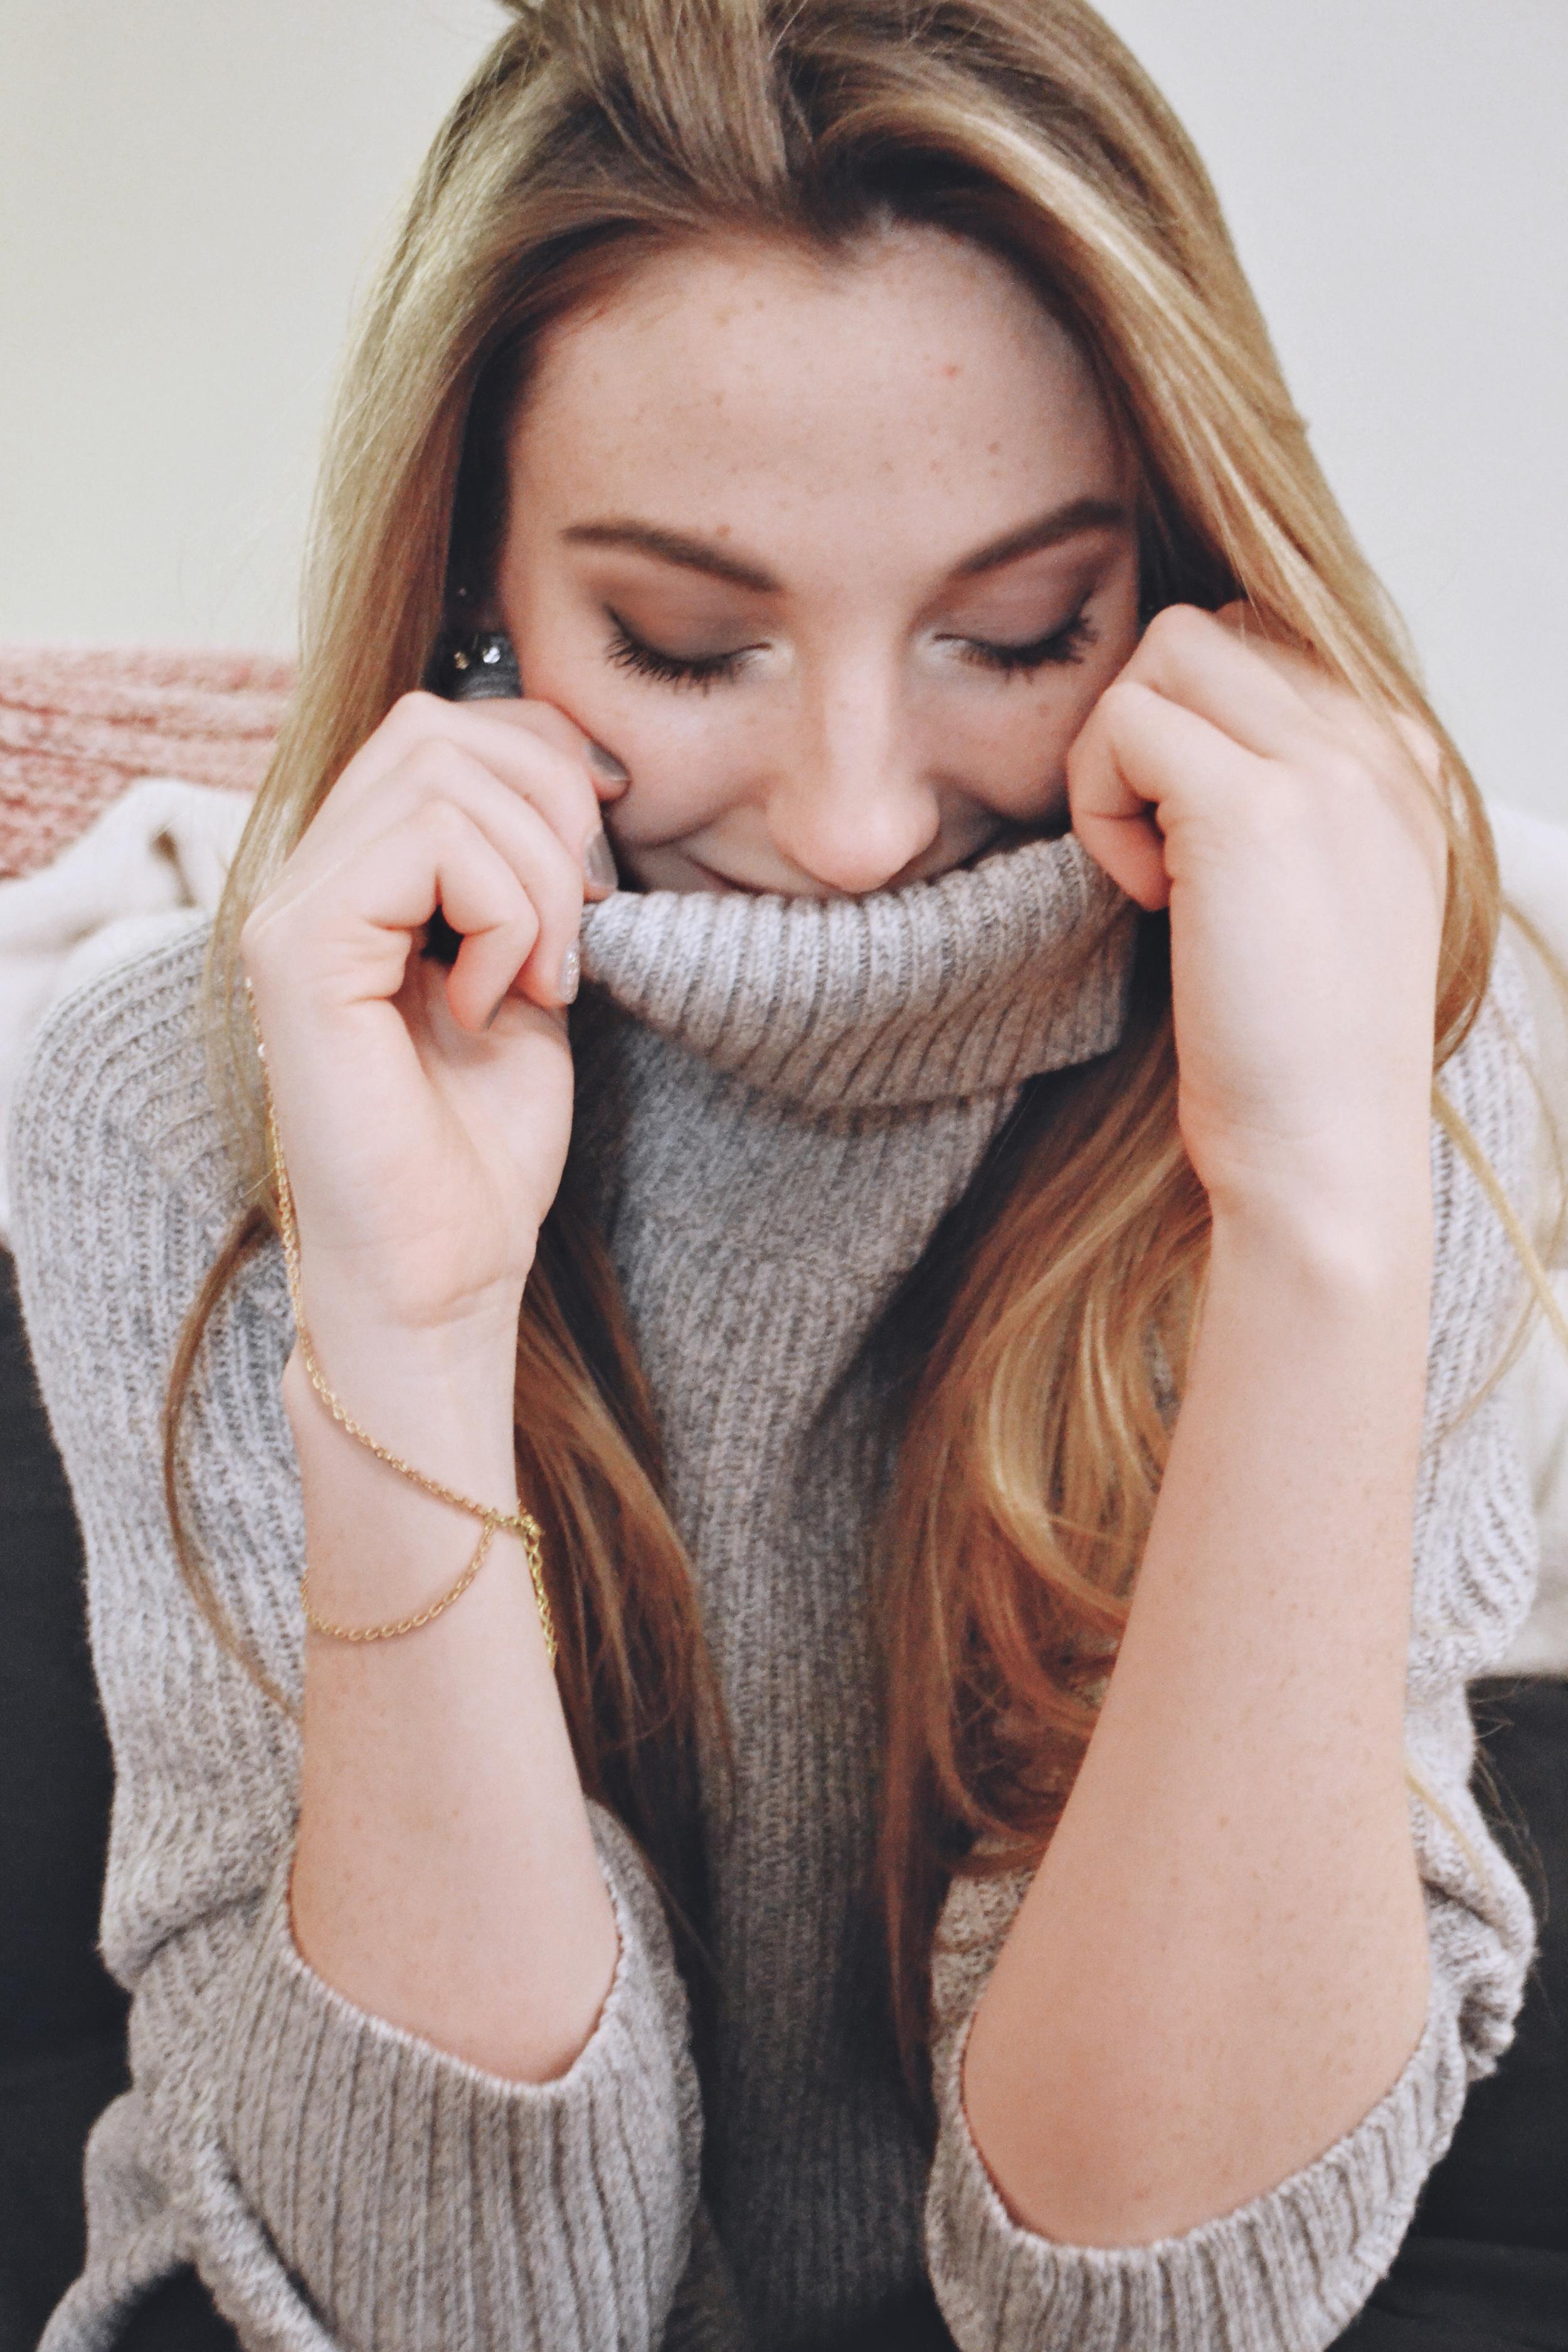 Oversized Sweater | Girl x Garment